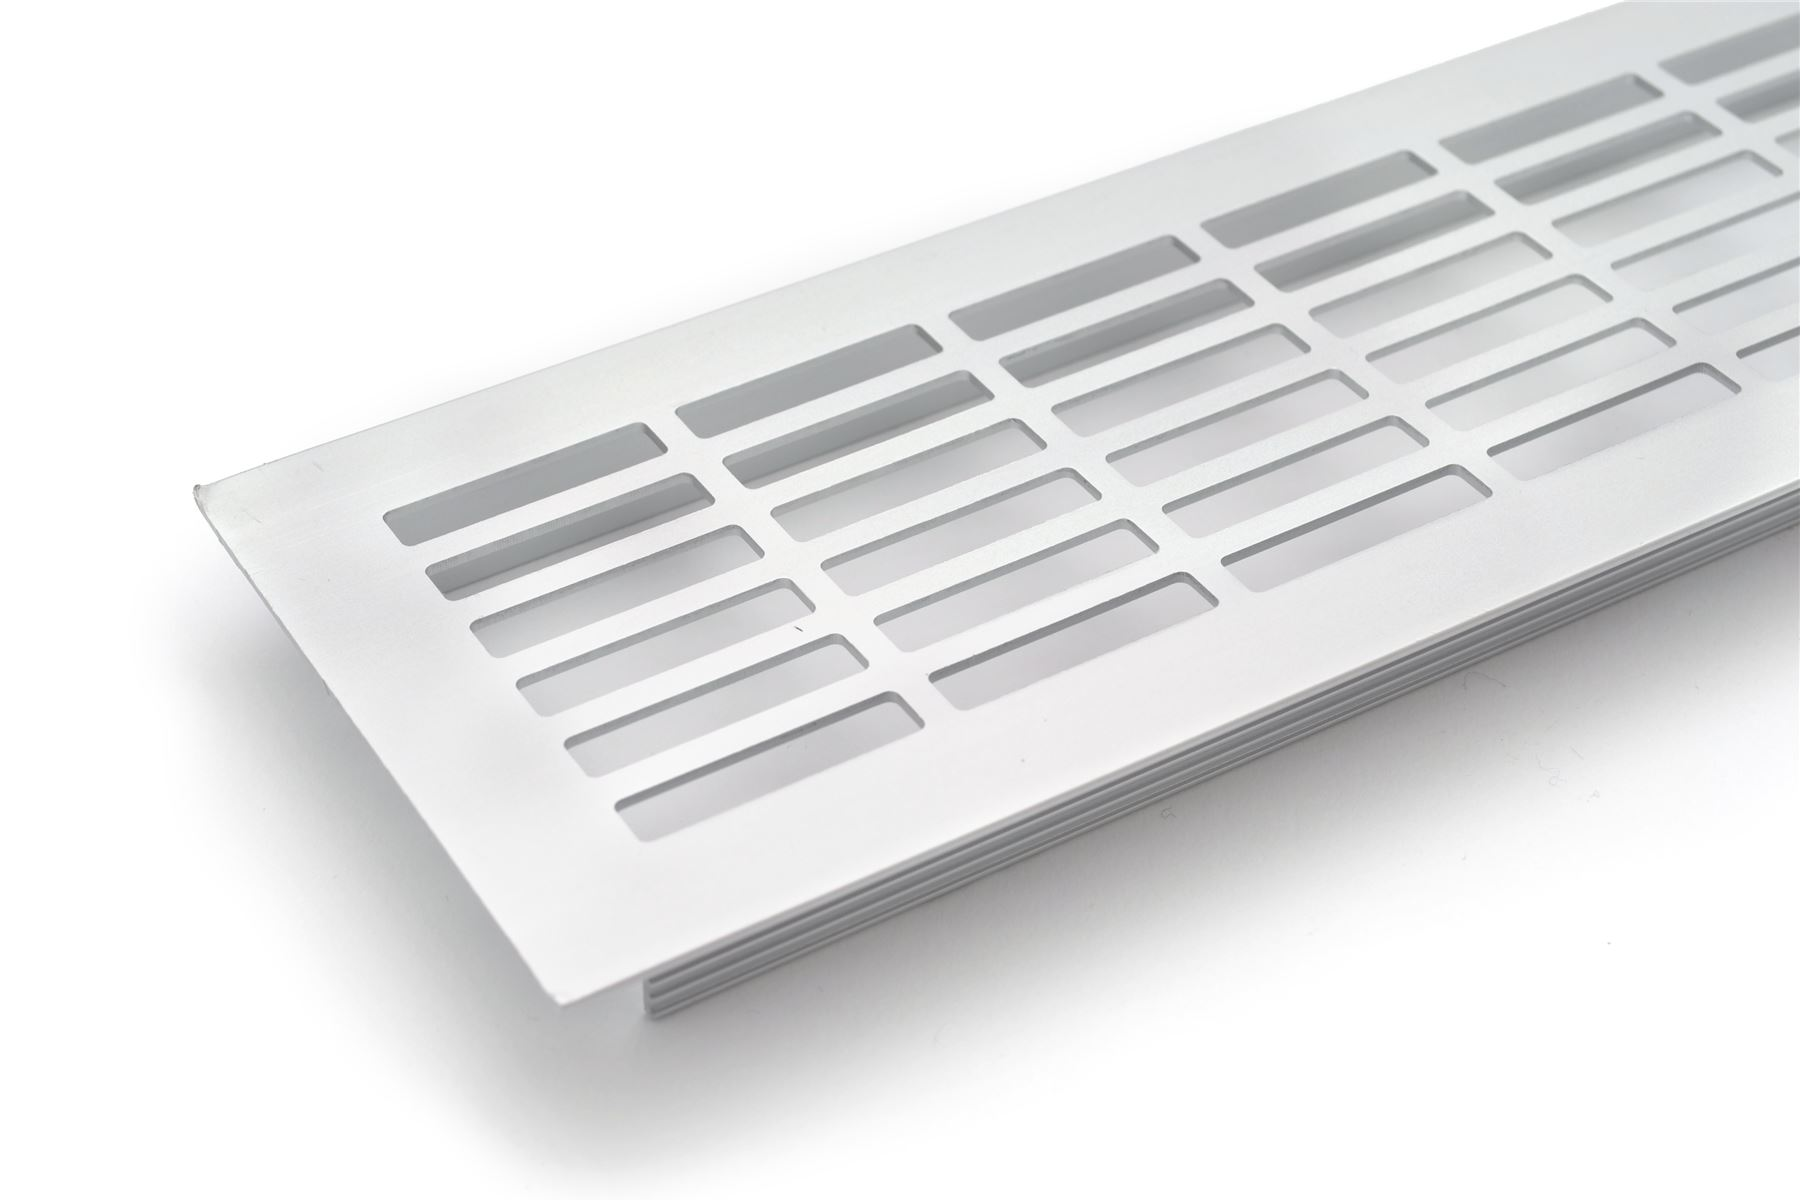 Aluminium white brushed chrome vent grill kitchen plinth worktop heat ebay - Grille ventilation aluminium ...